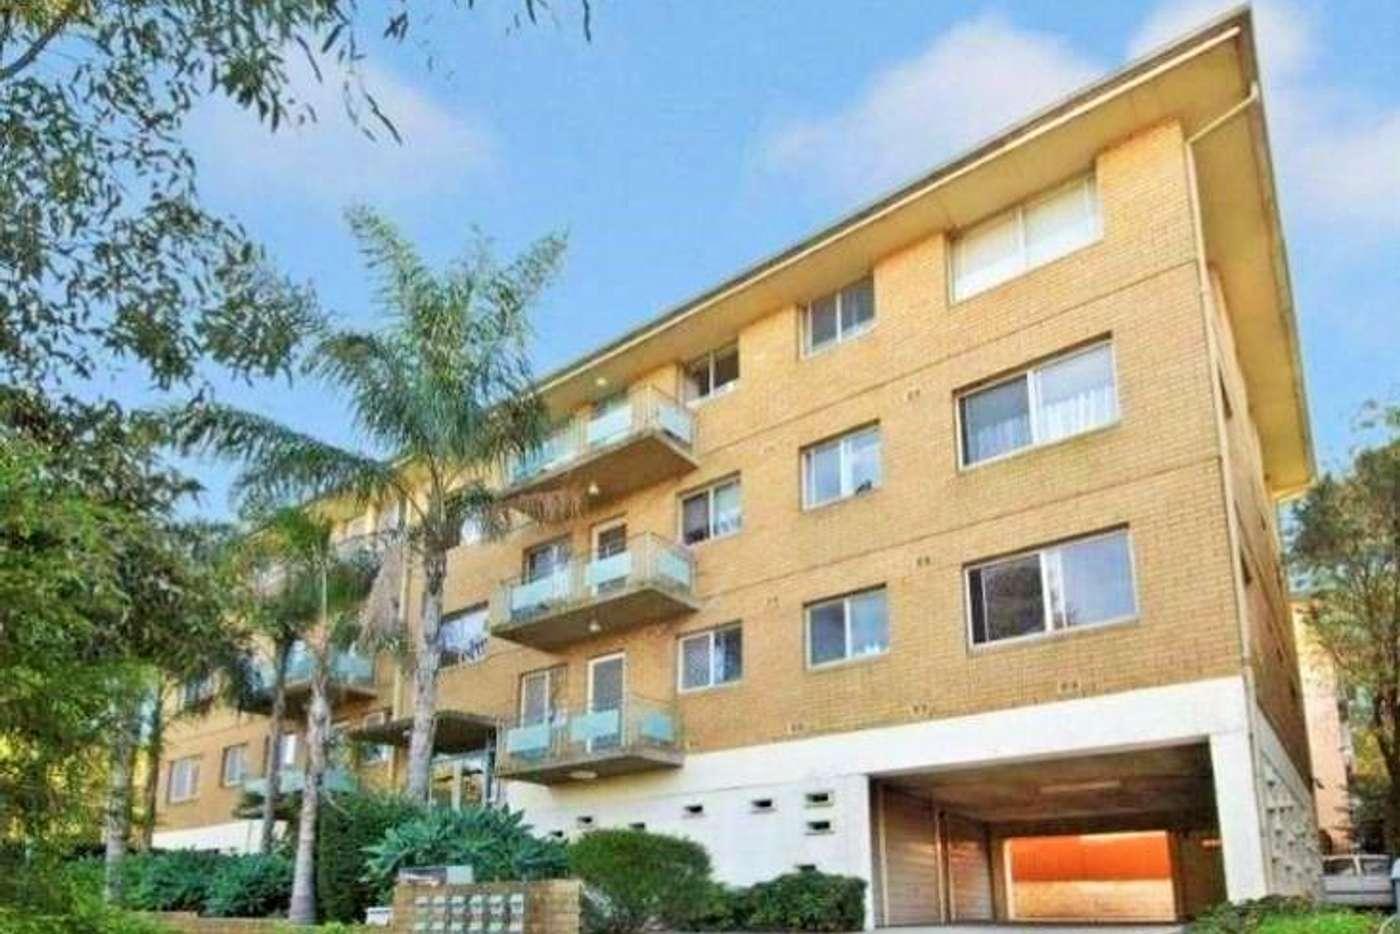 Main view of Homely apartment listing, 5/3 Pitt Street, Parramatta NSW 2150